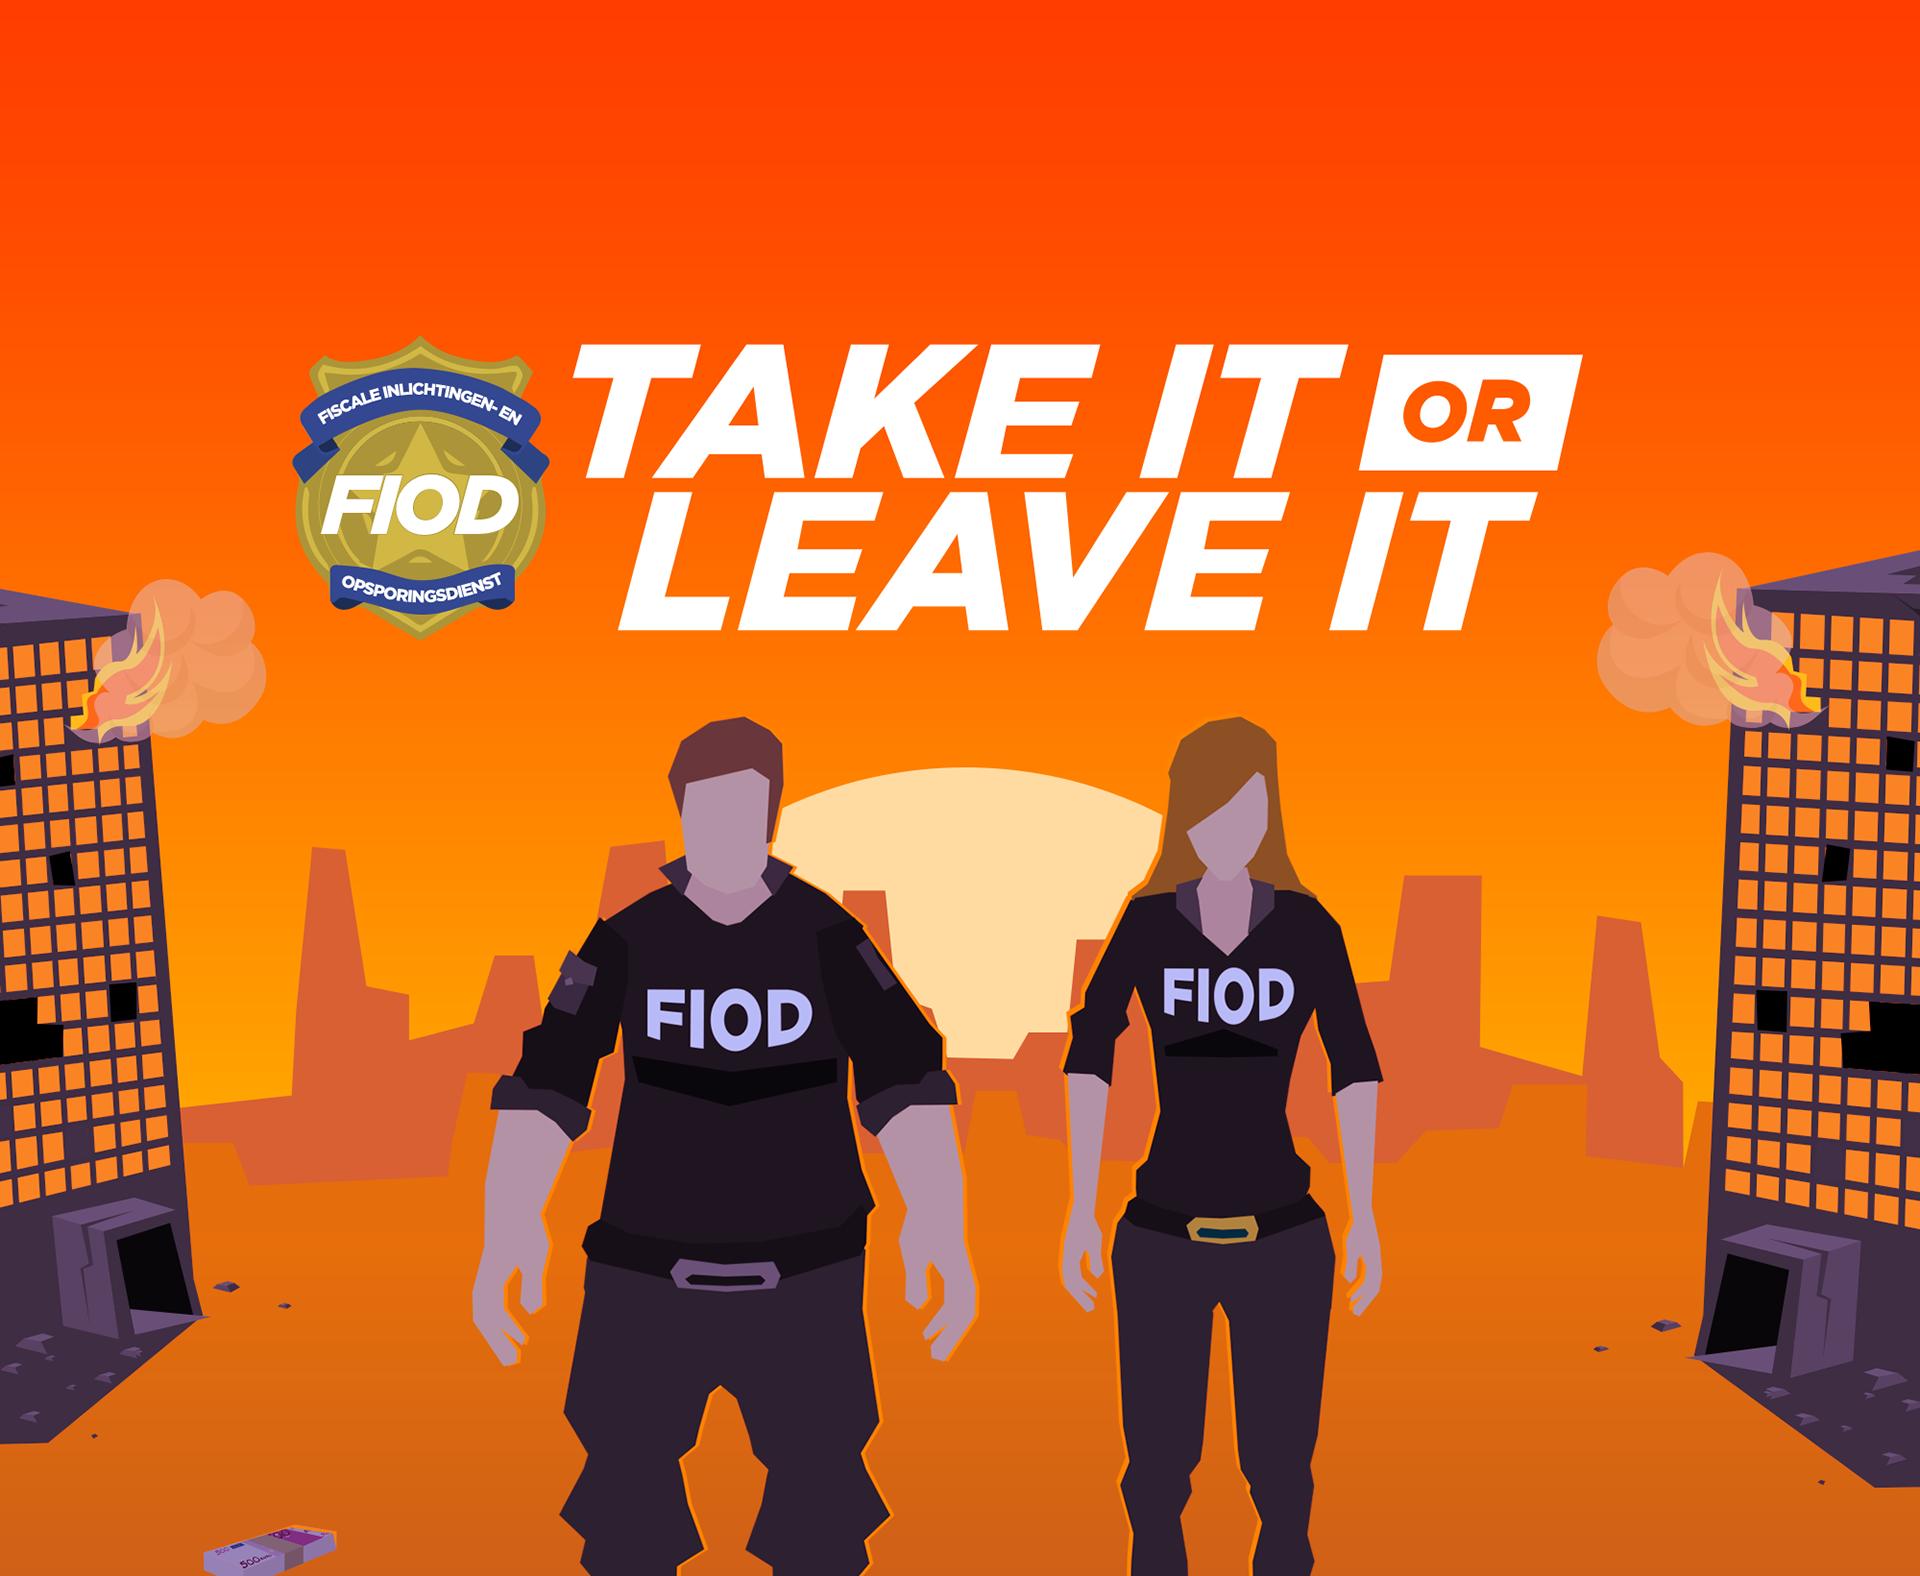 FIOD – Take it or Leave it